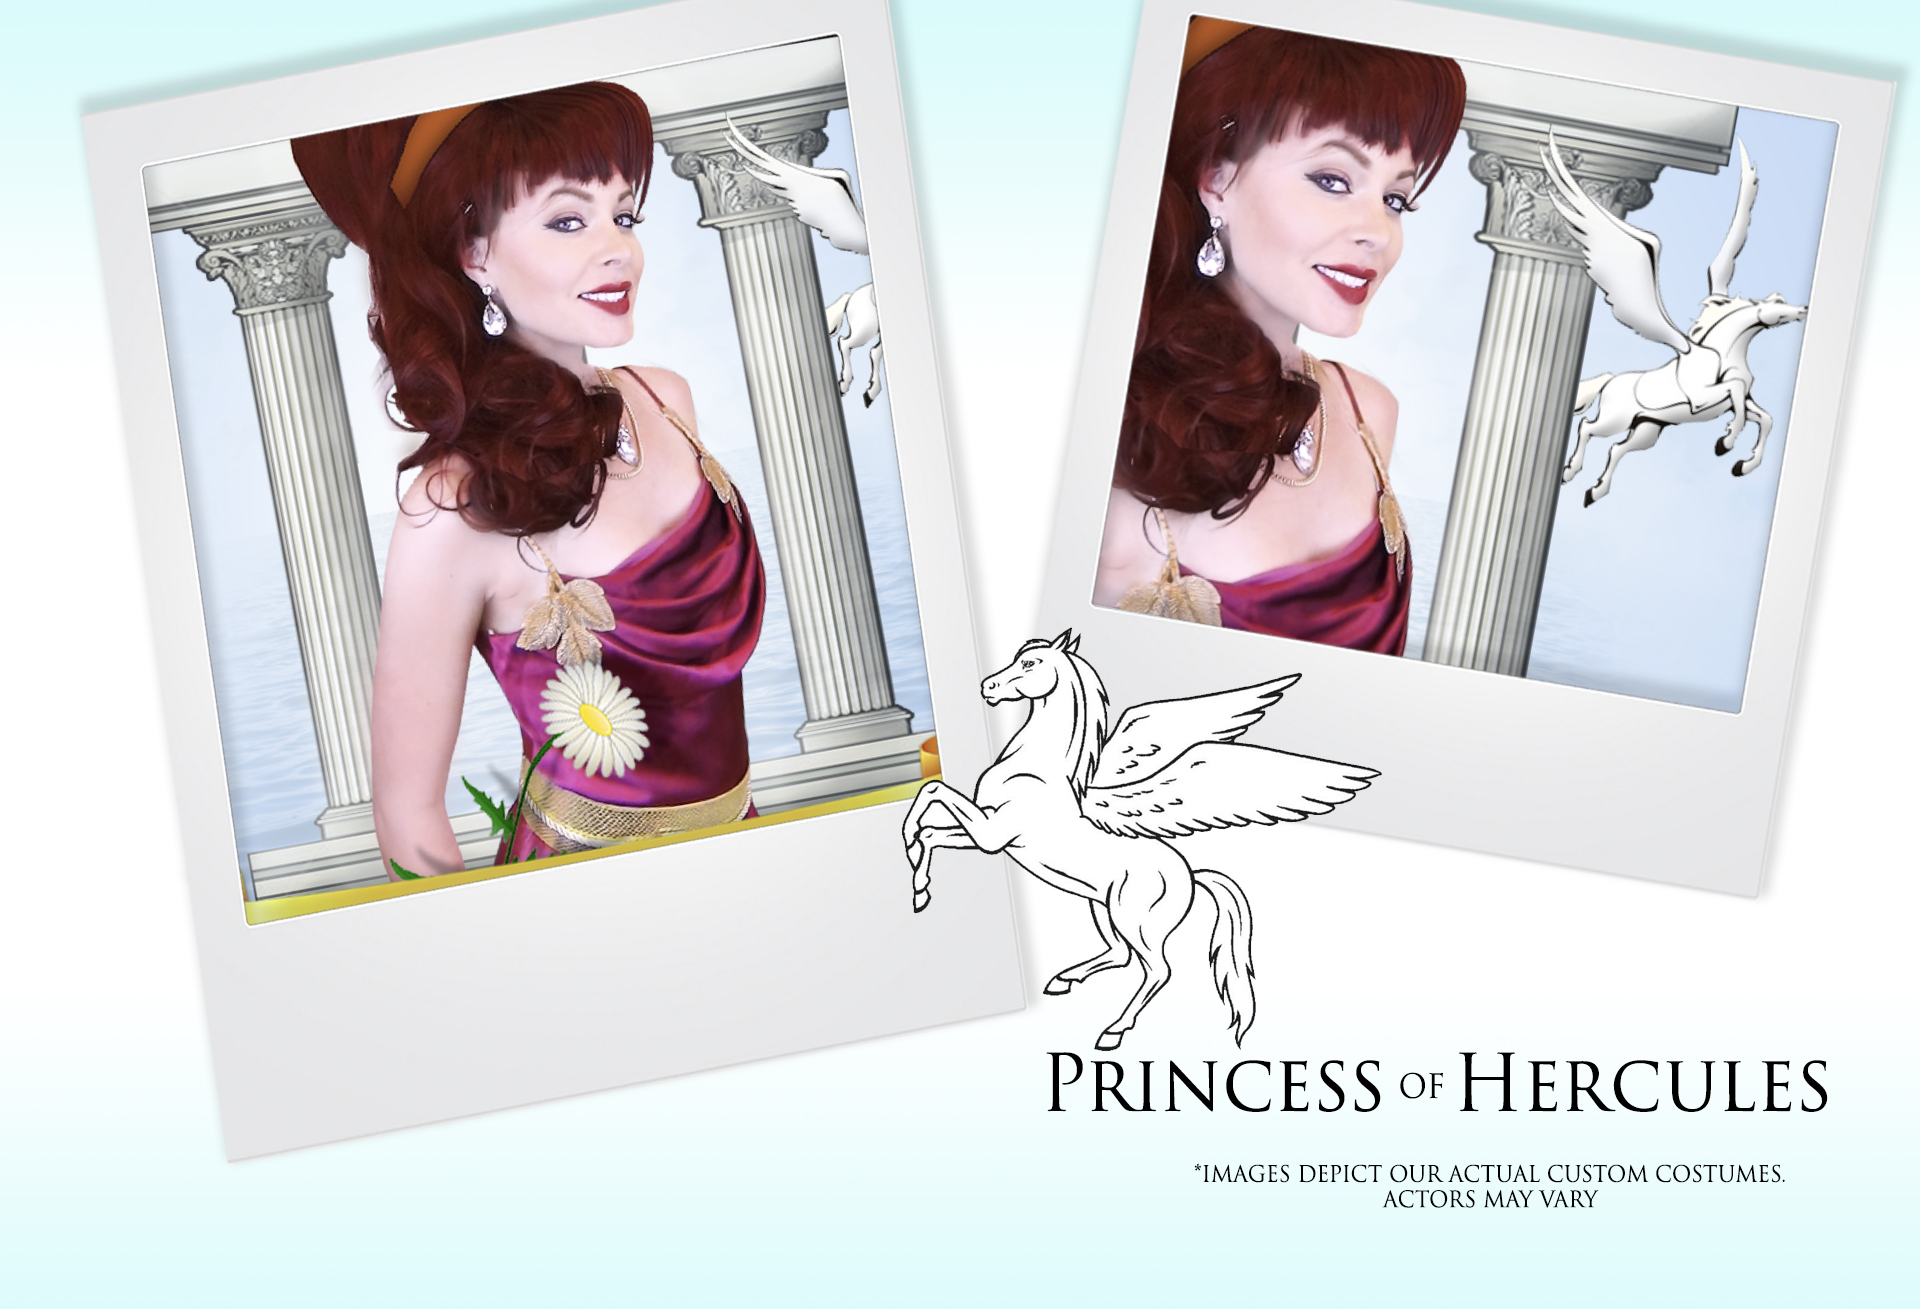 Princess of Hercules